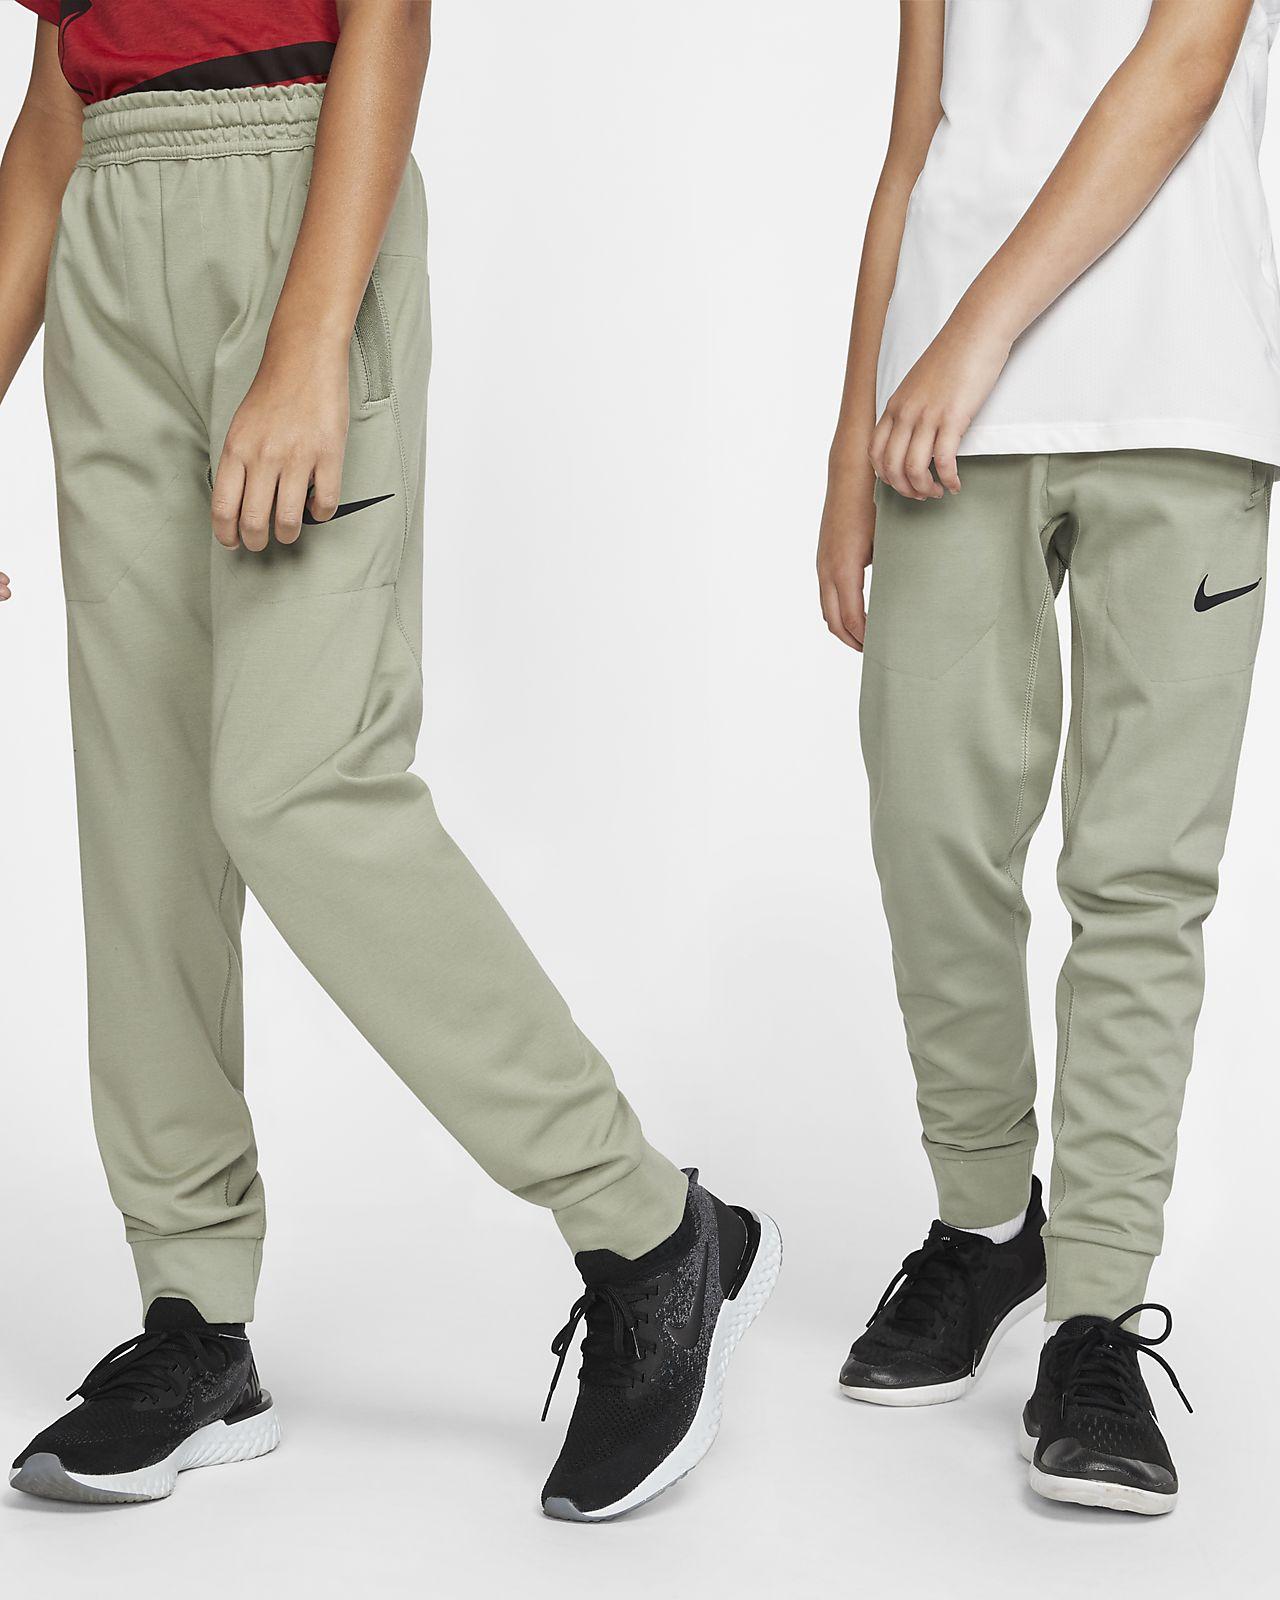 size 7 100% genuine coupon codes Nike Tech Pack Hose für Kinder